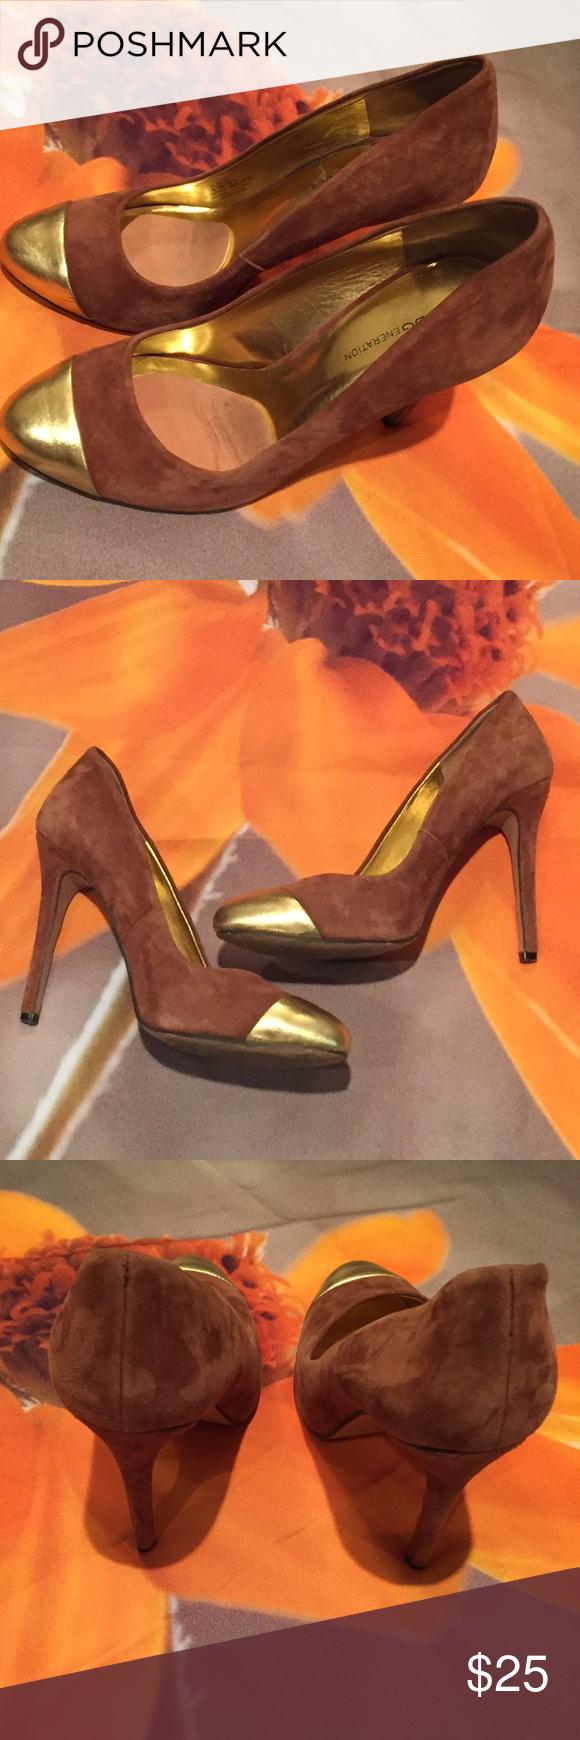 BCBG Generation Heels Excellent Condition 4 inch heels BCBGeneration Shoes Heels